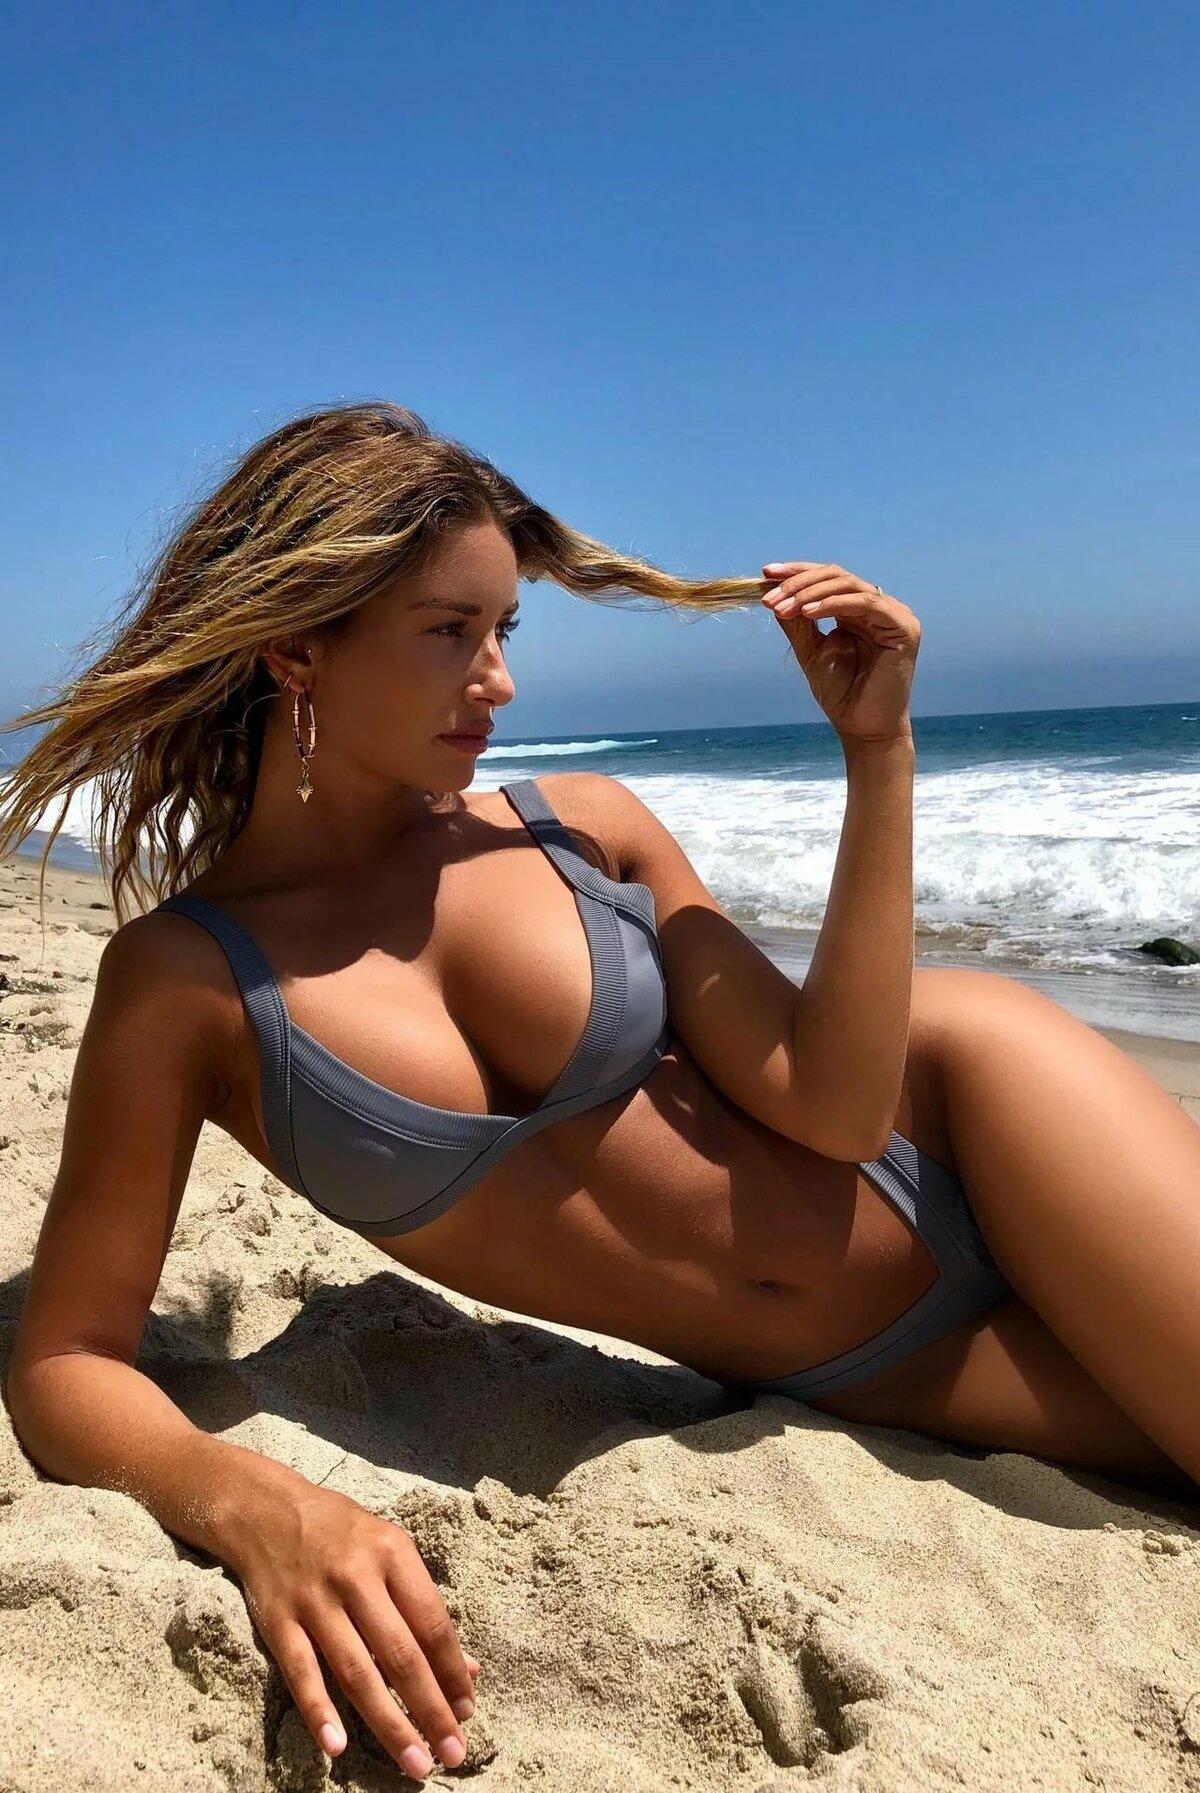 babes-in-bikini-beach-video